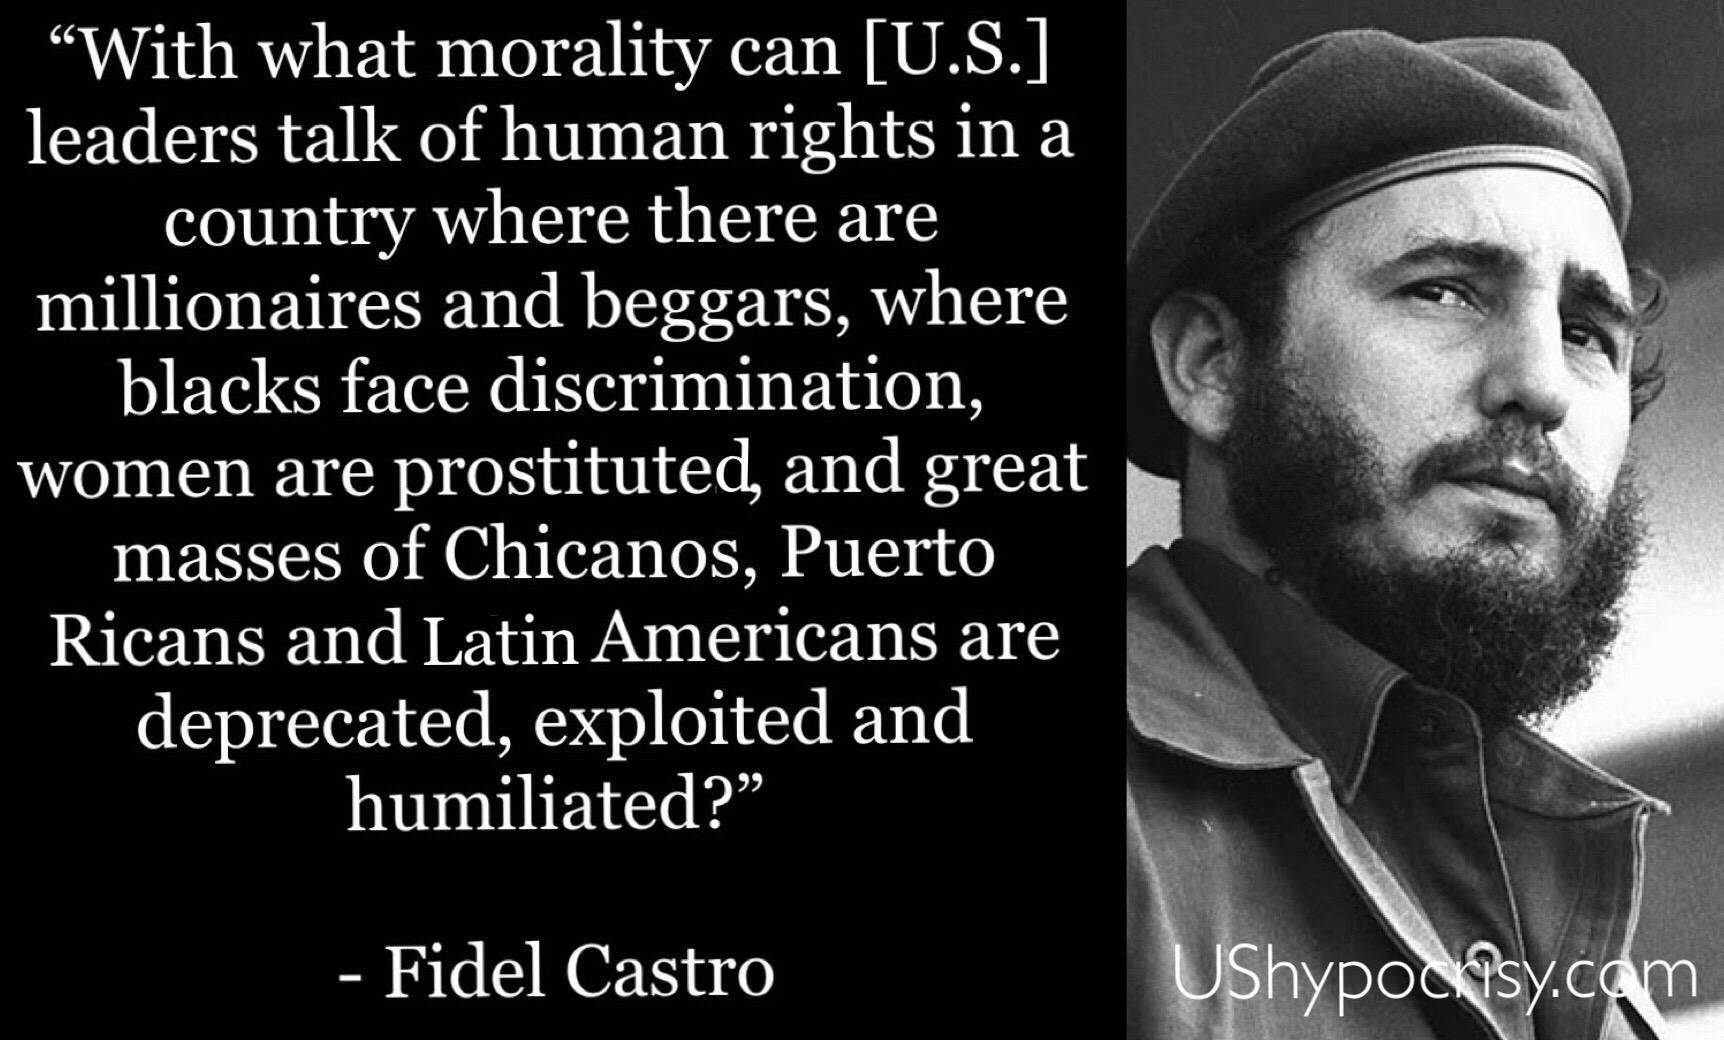 Fidel Castro on U.S. human rights and hypocrisy